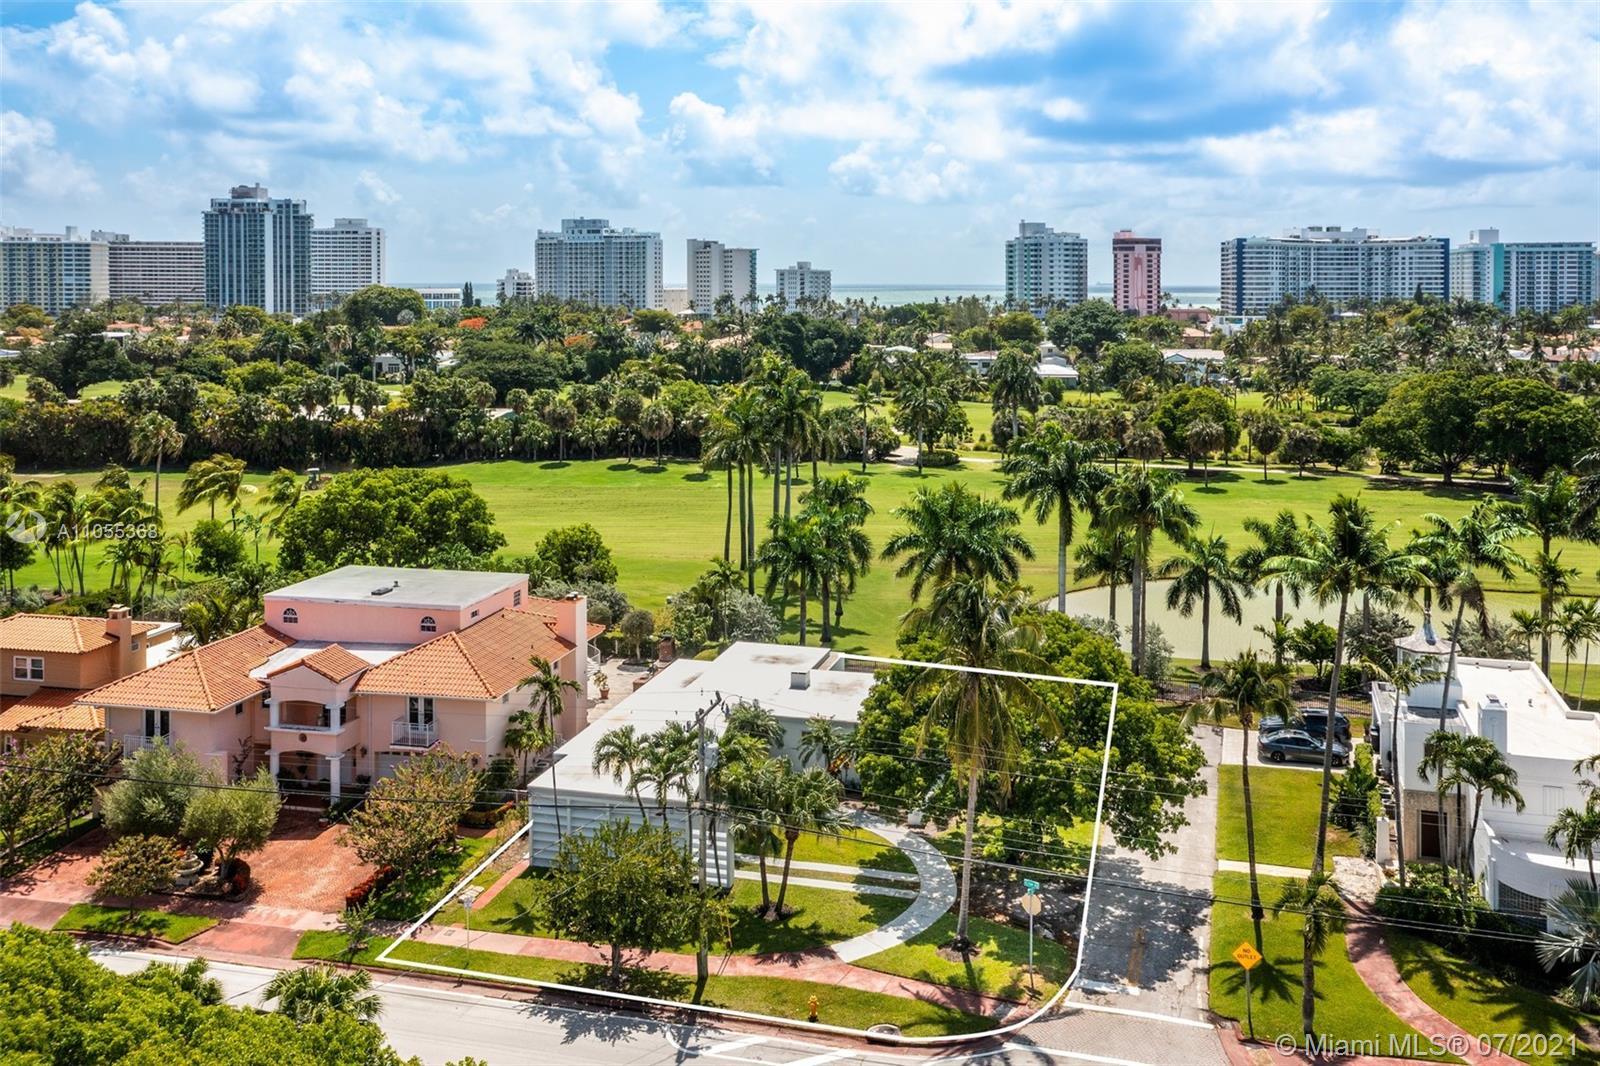 La Gorce Golf - 5301 Alton Rd, Miami Beach, FL 33140